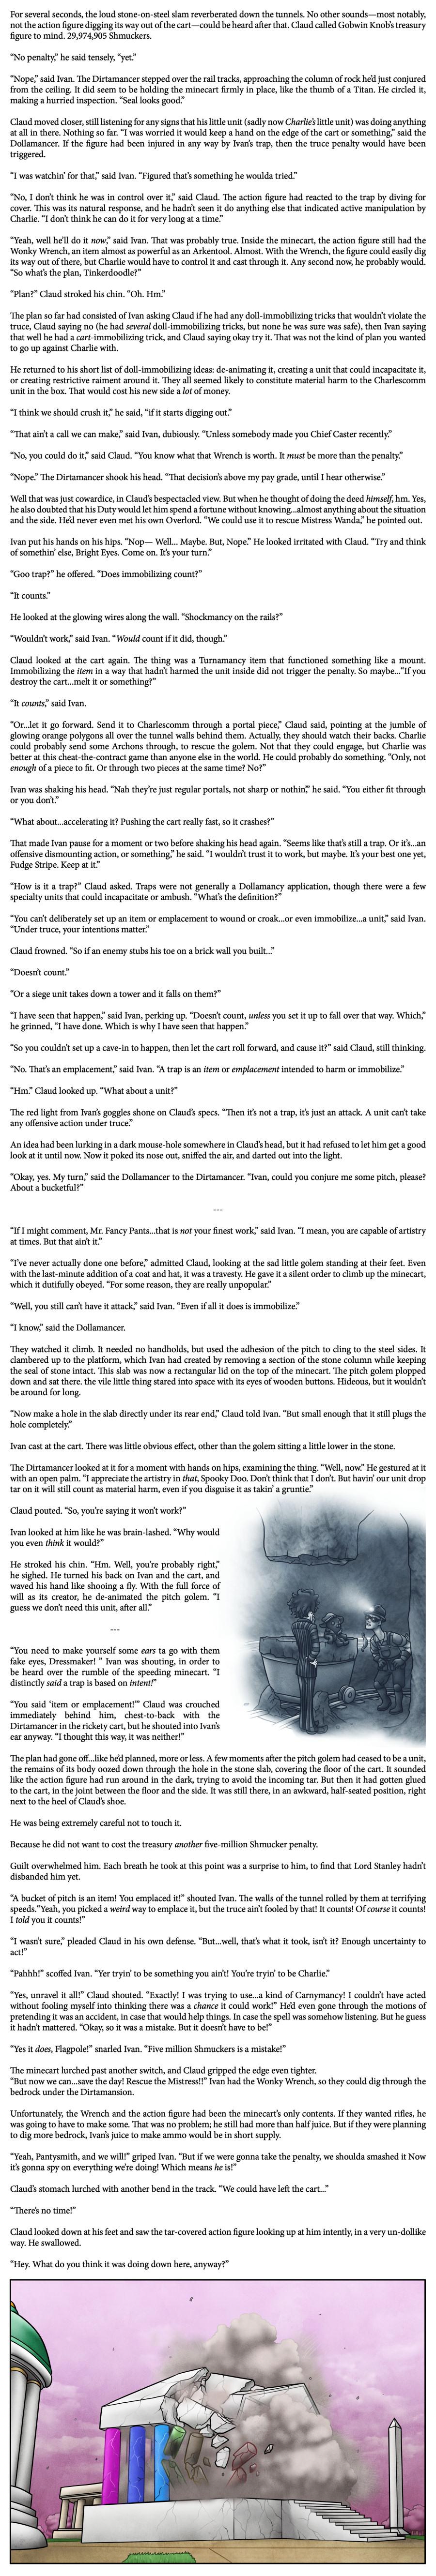 Comic - Book 4 - Page 97